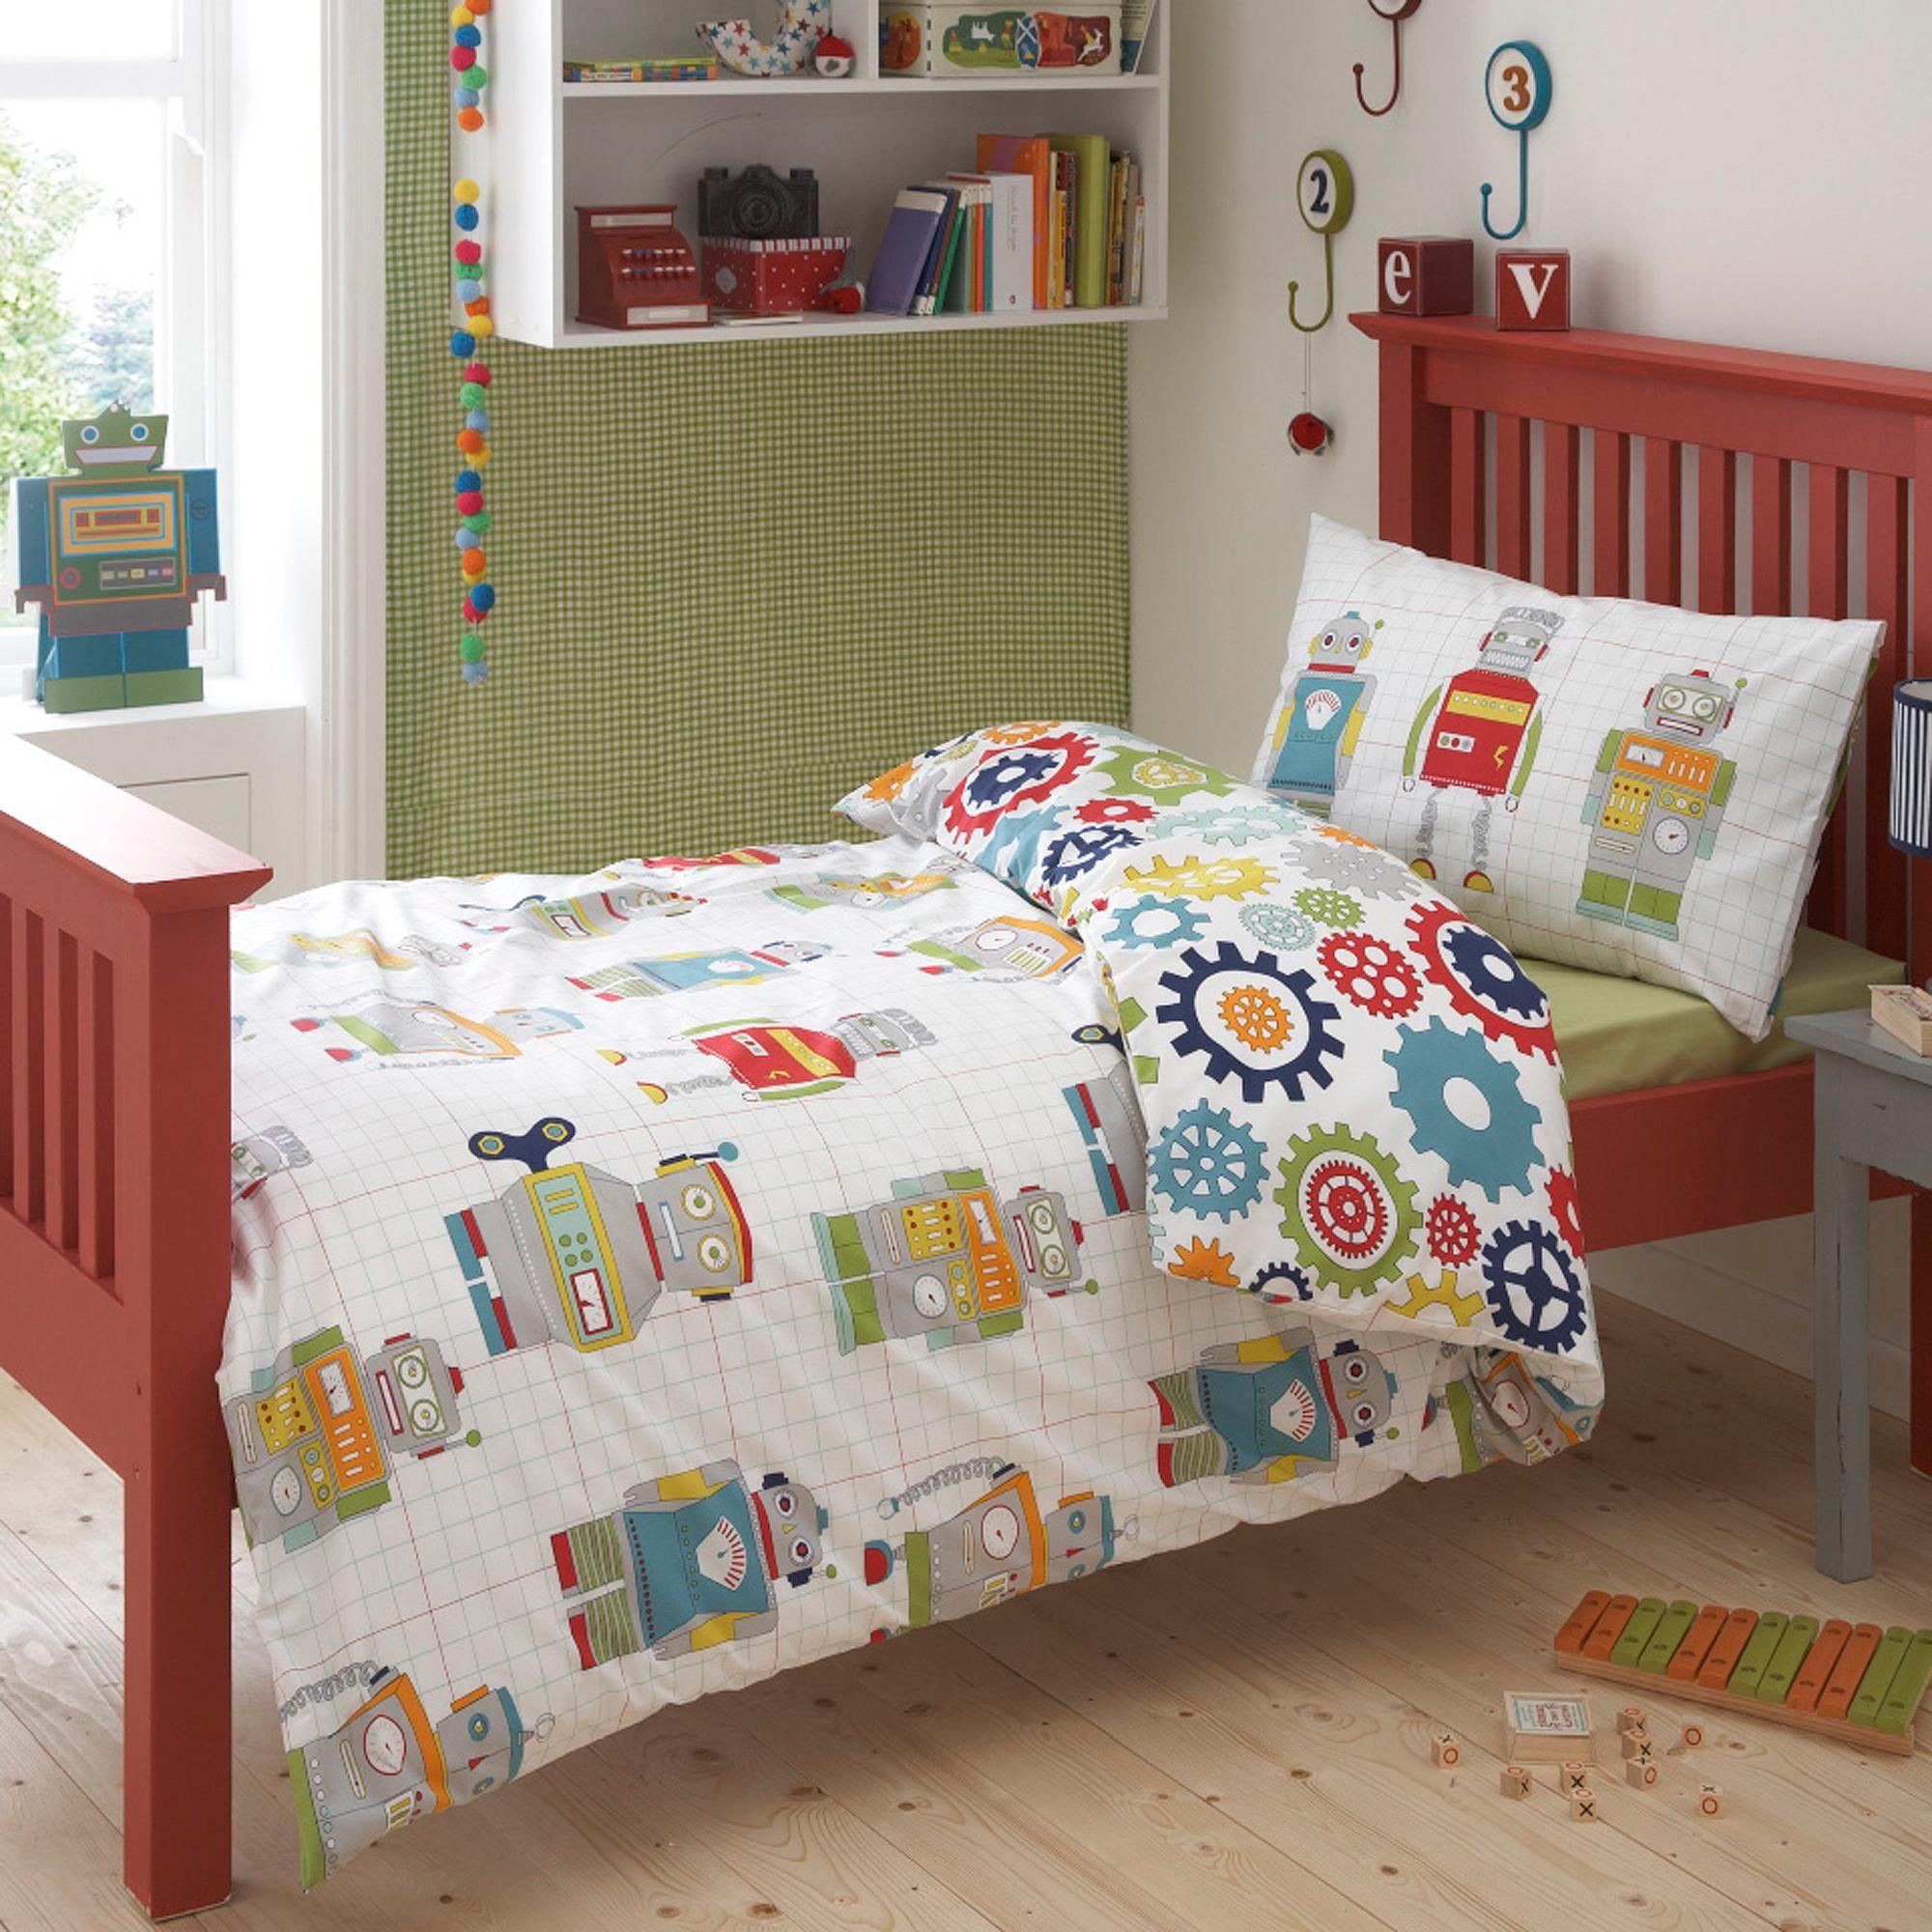 robot bedding  decor (james' room)  pinterest  room and nursery - robot bedding